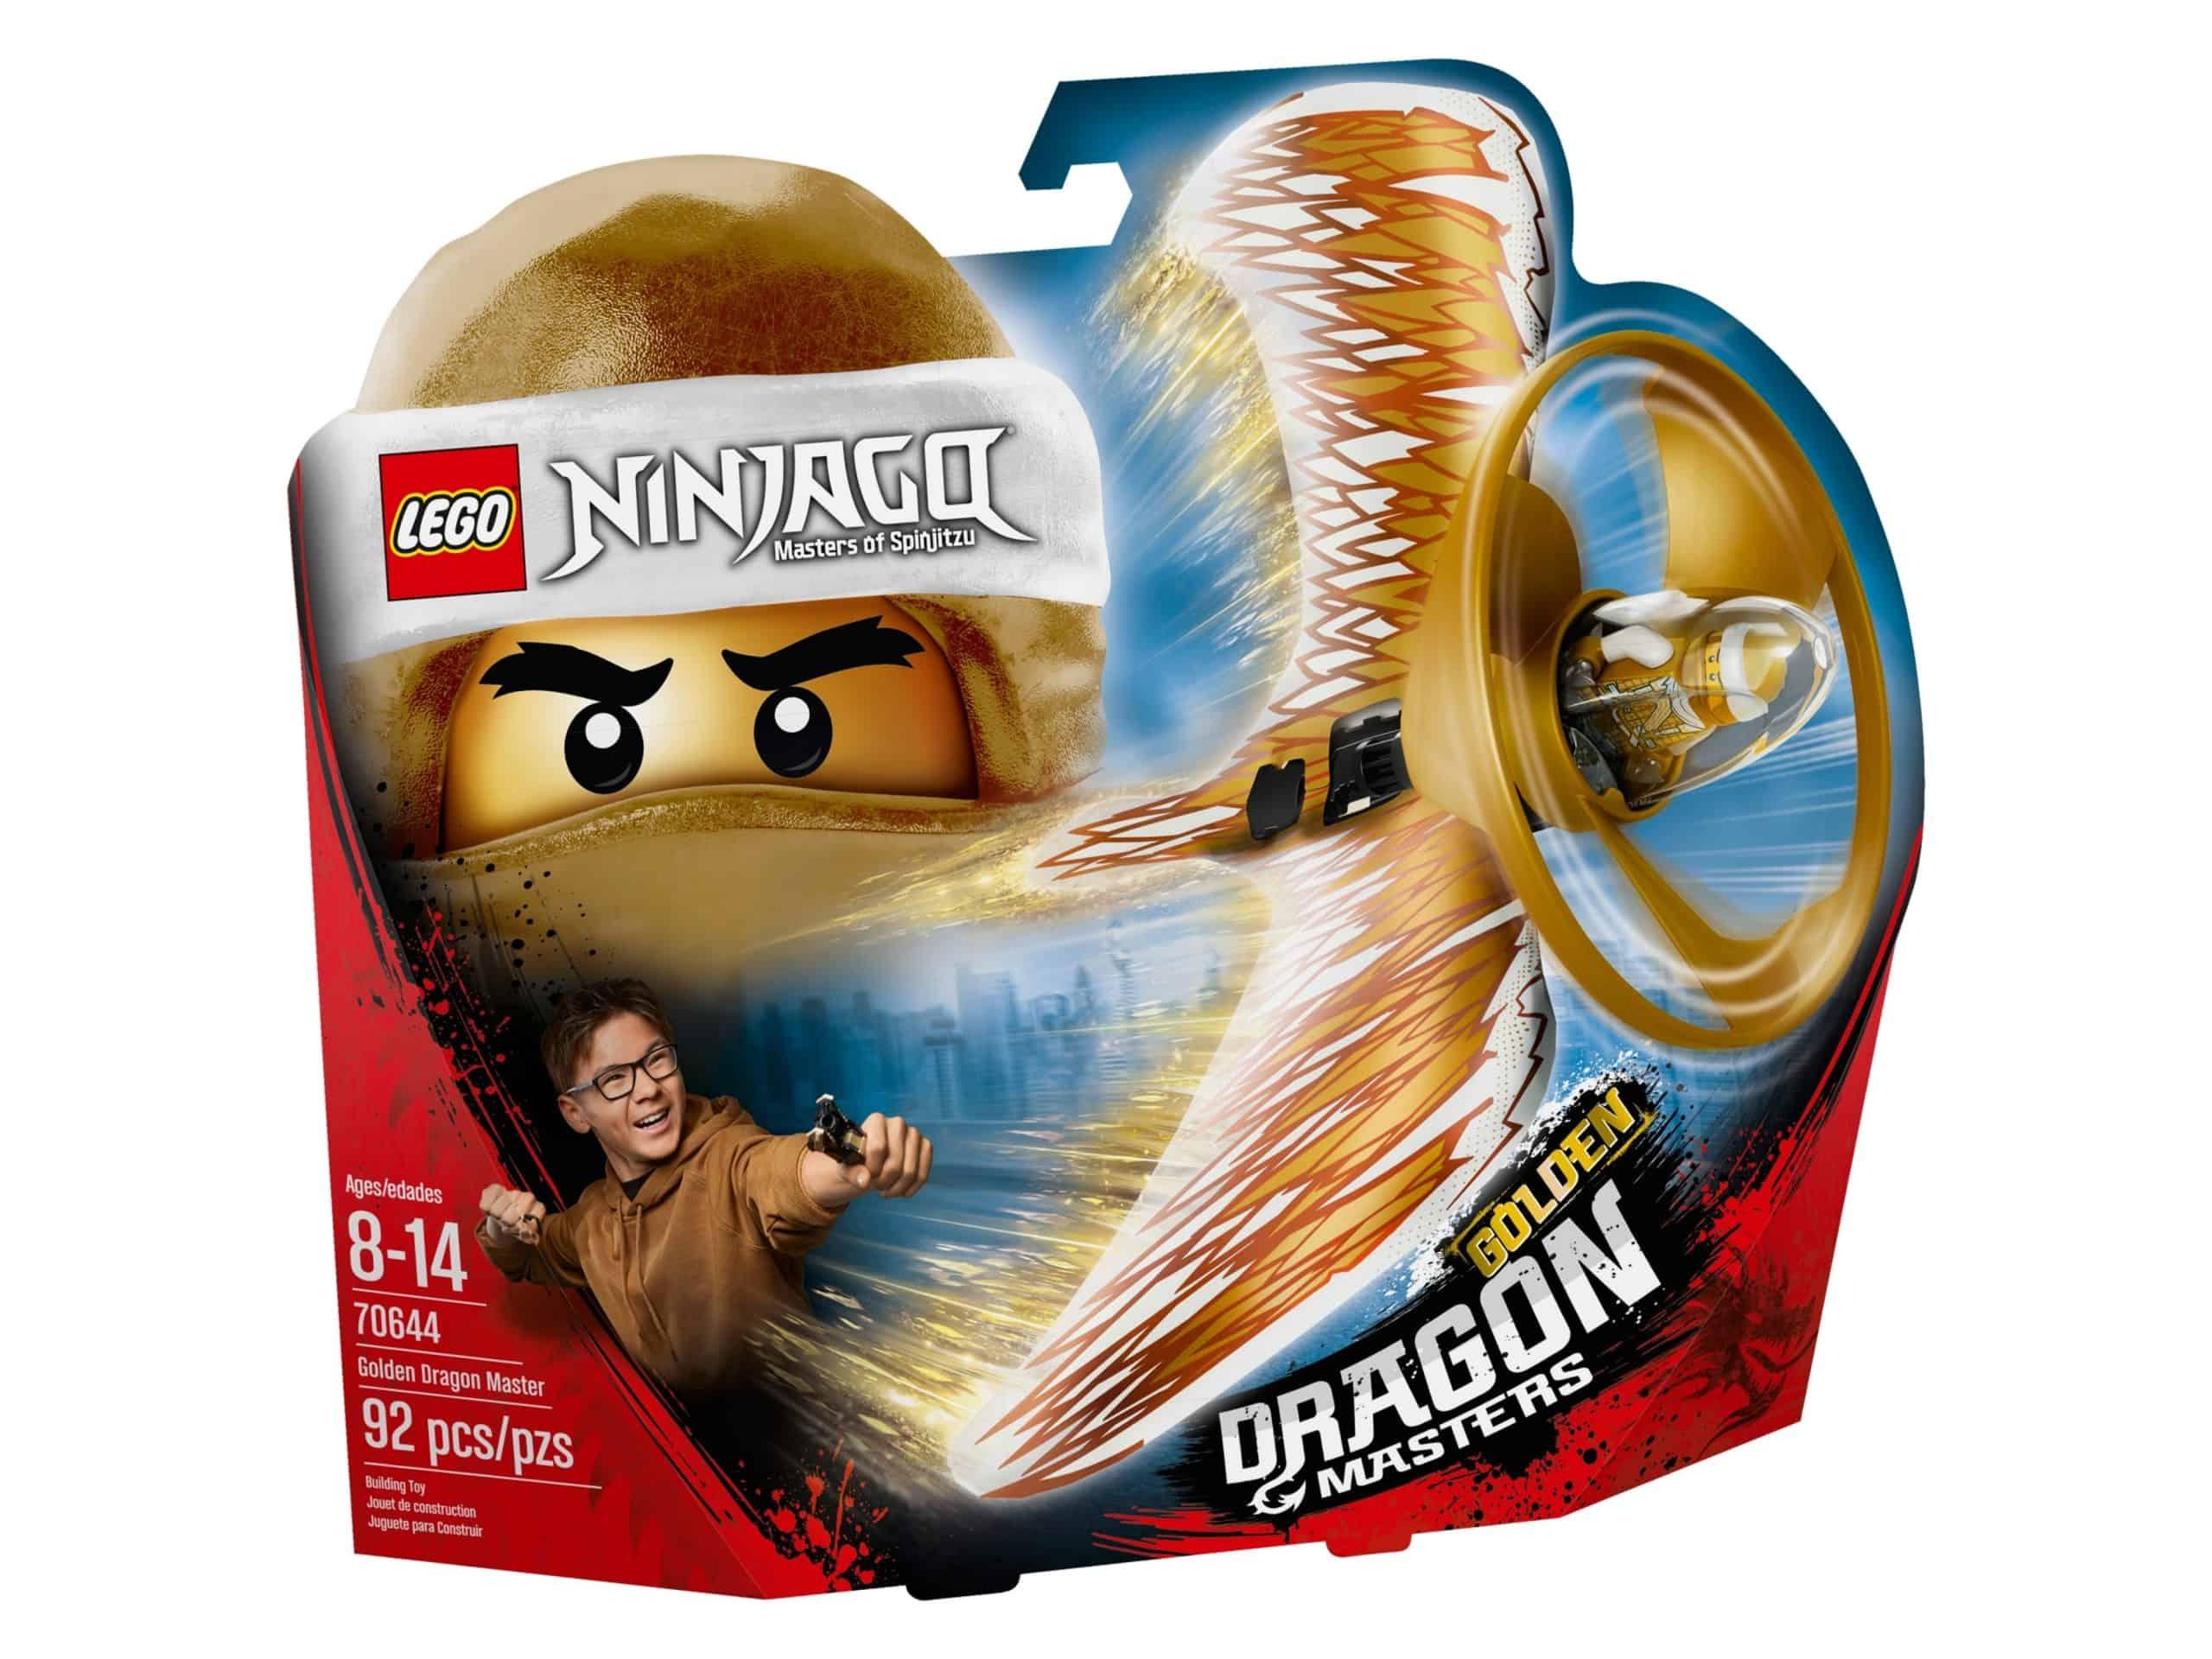 lego 70644 den gyldne dragemester scaled